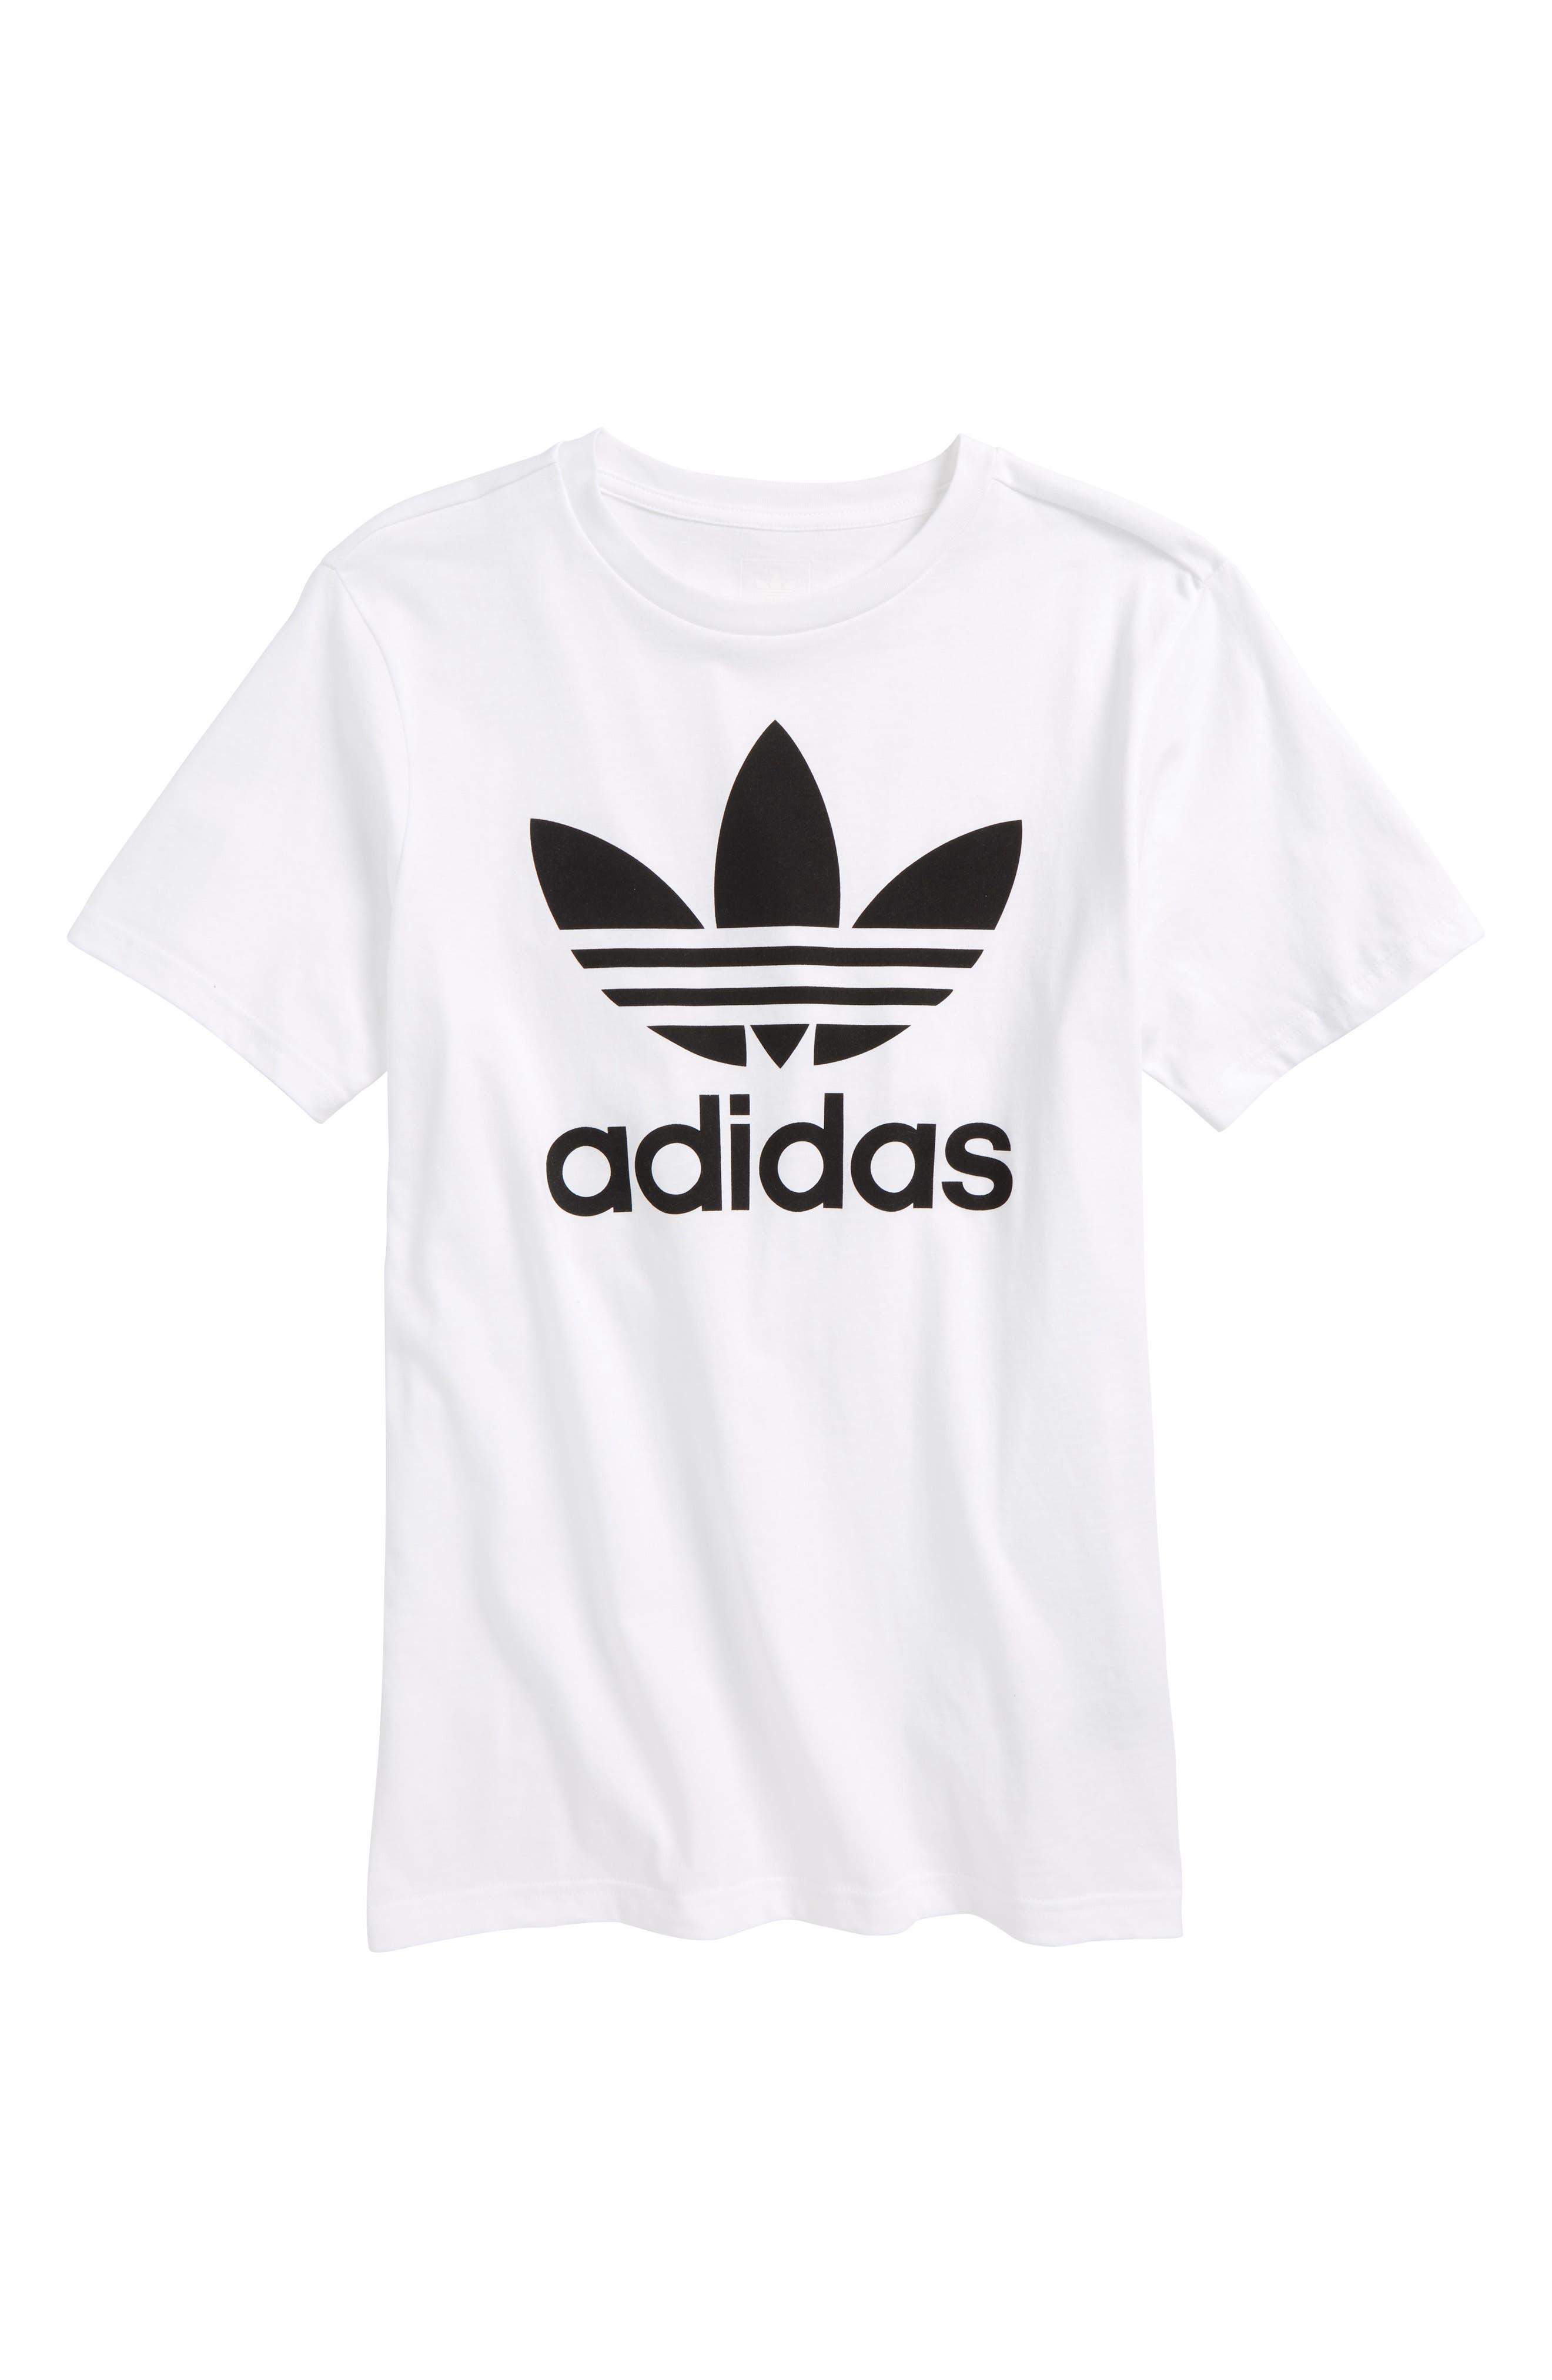 adidas Trefoil Logo T-Shirt,                         Main,                         color, White/ Black